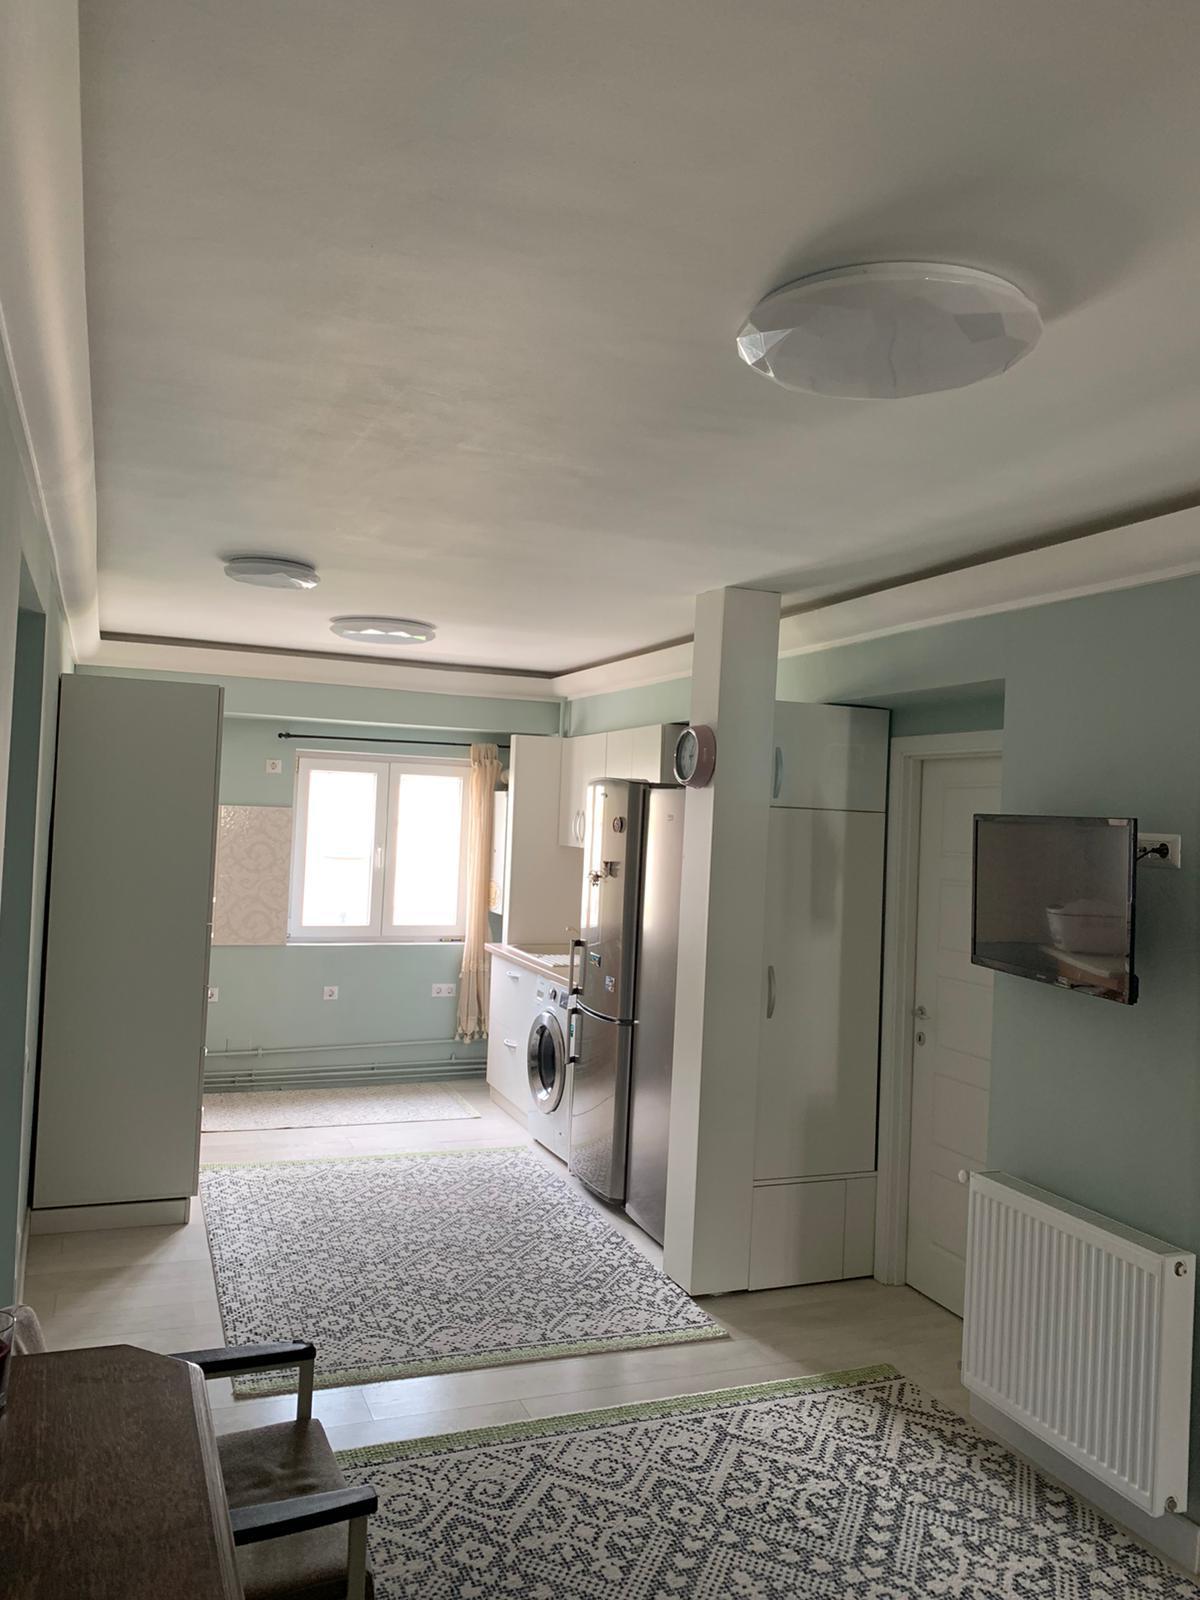 188091-Vanzare apartament 3 camere, Manastur, Cluj-Napoca